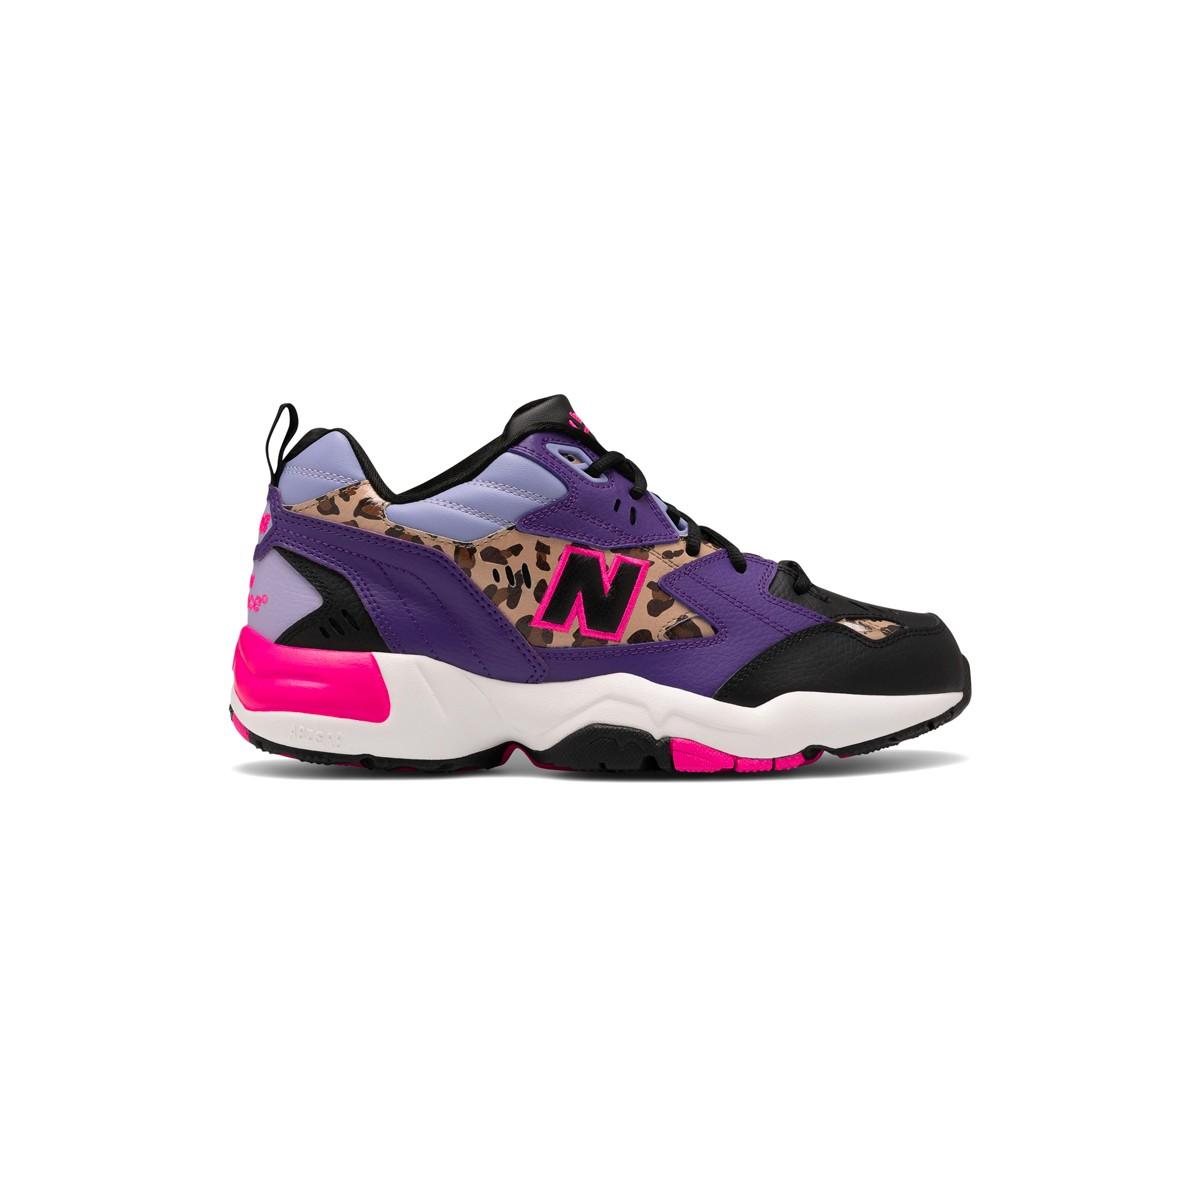 chaussure femmes bordeaux 35 new balance